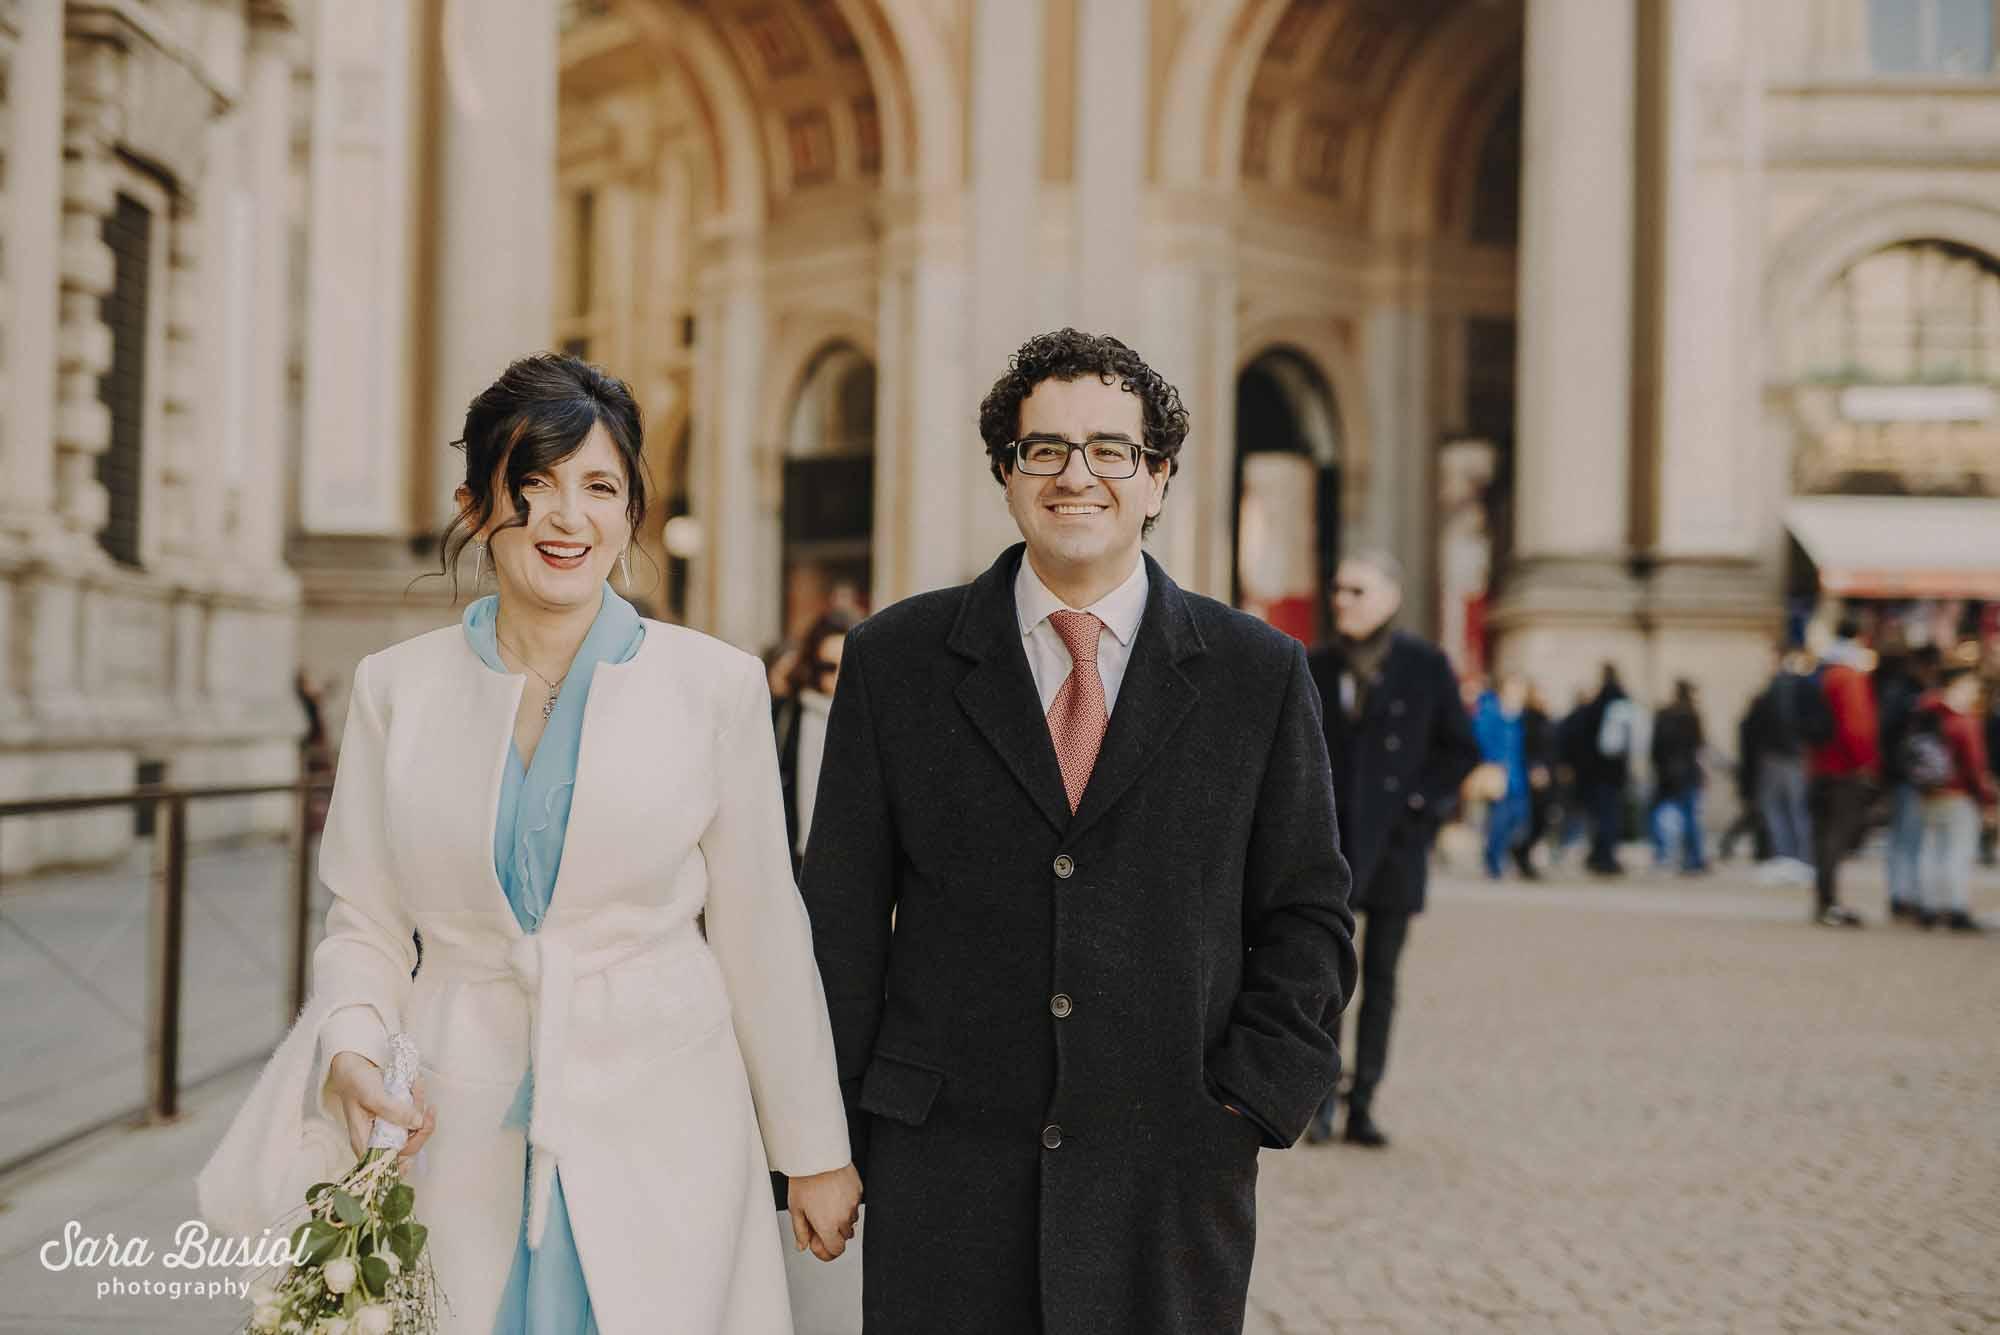 matrimonio milano palazzo reale-11